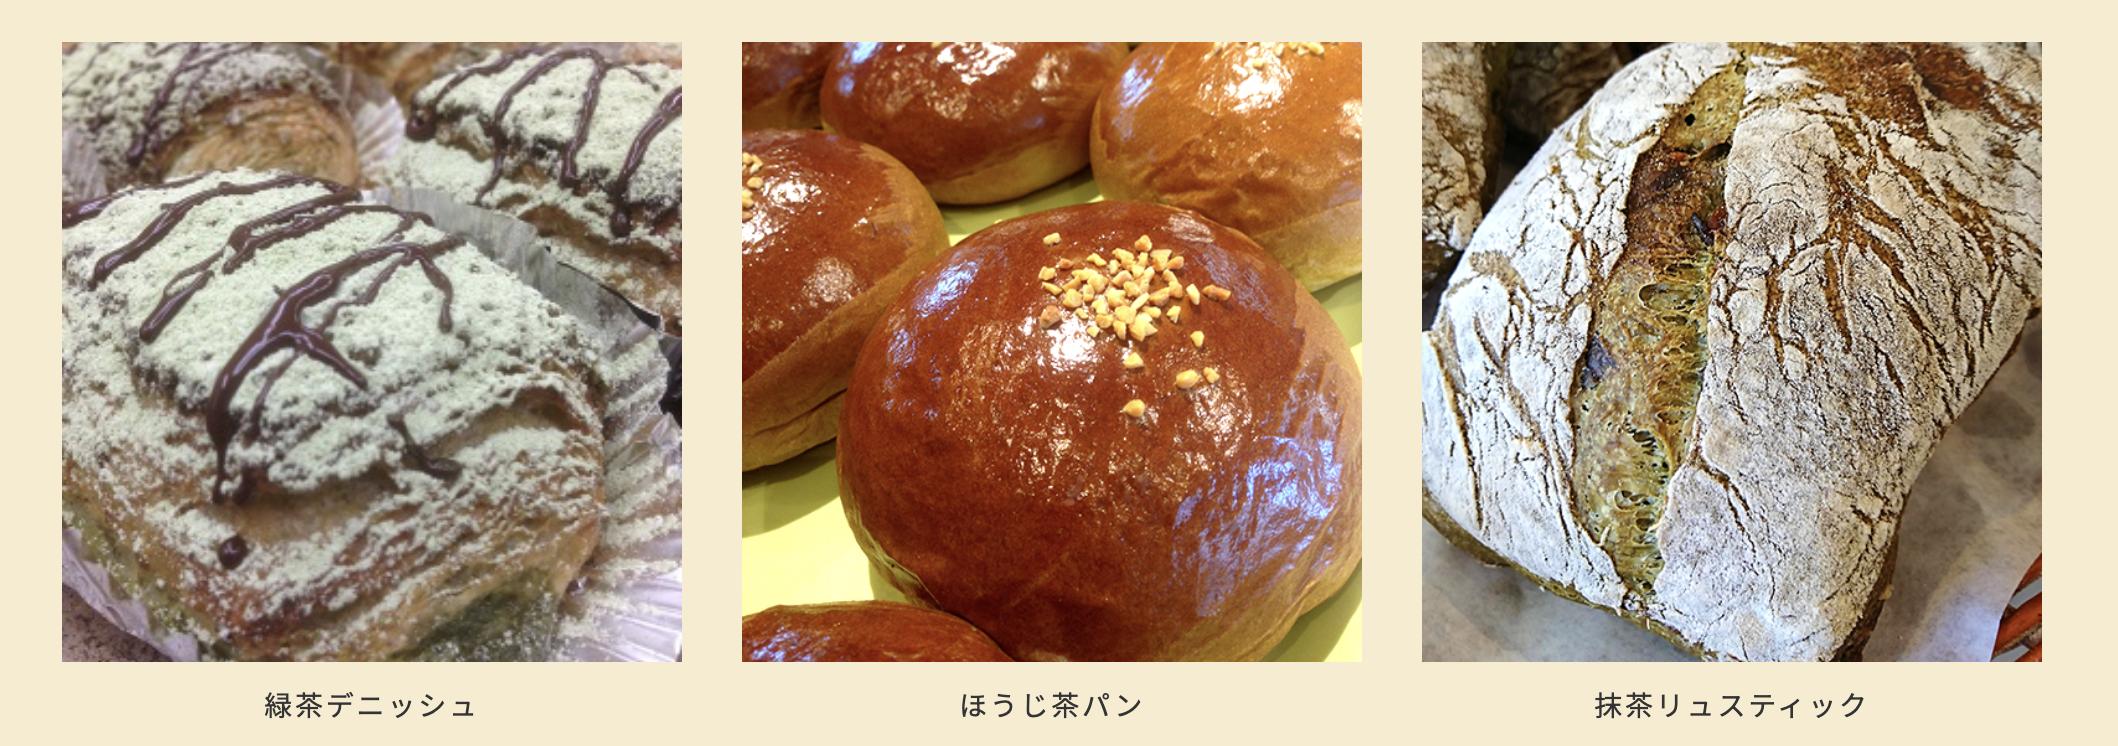 宇治美食-mogmog Bakery